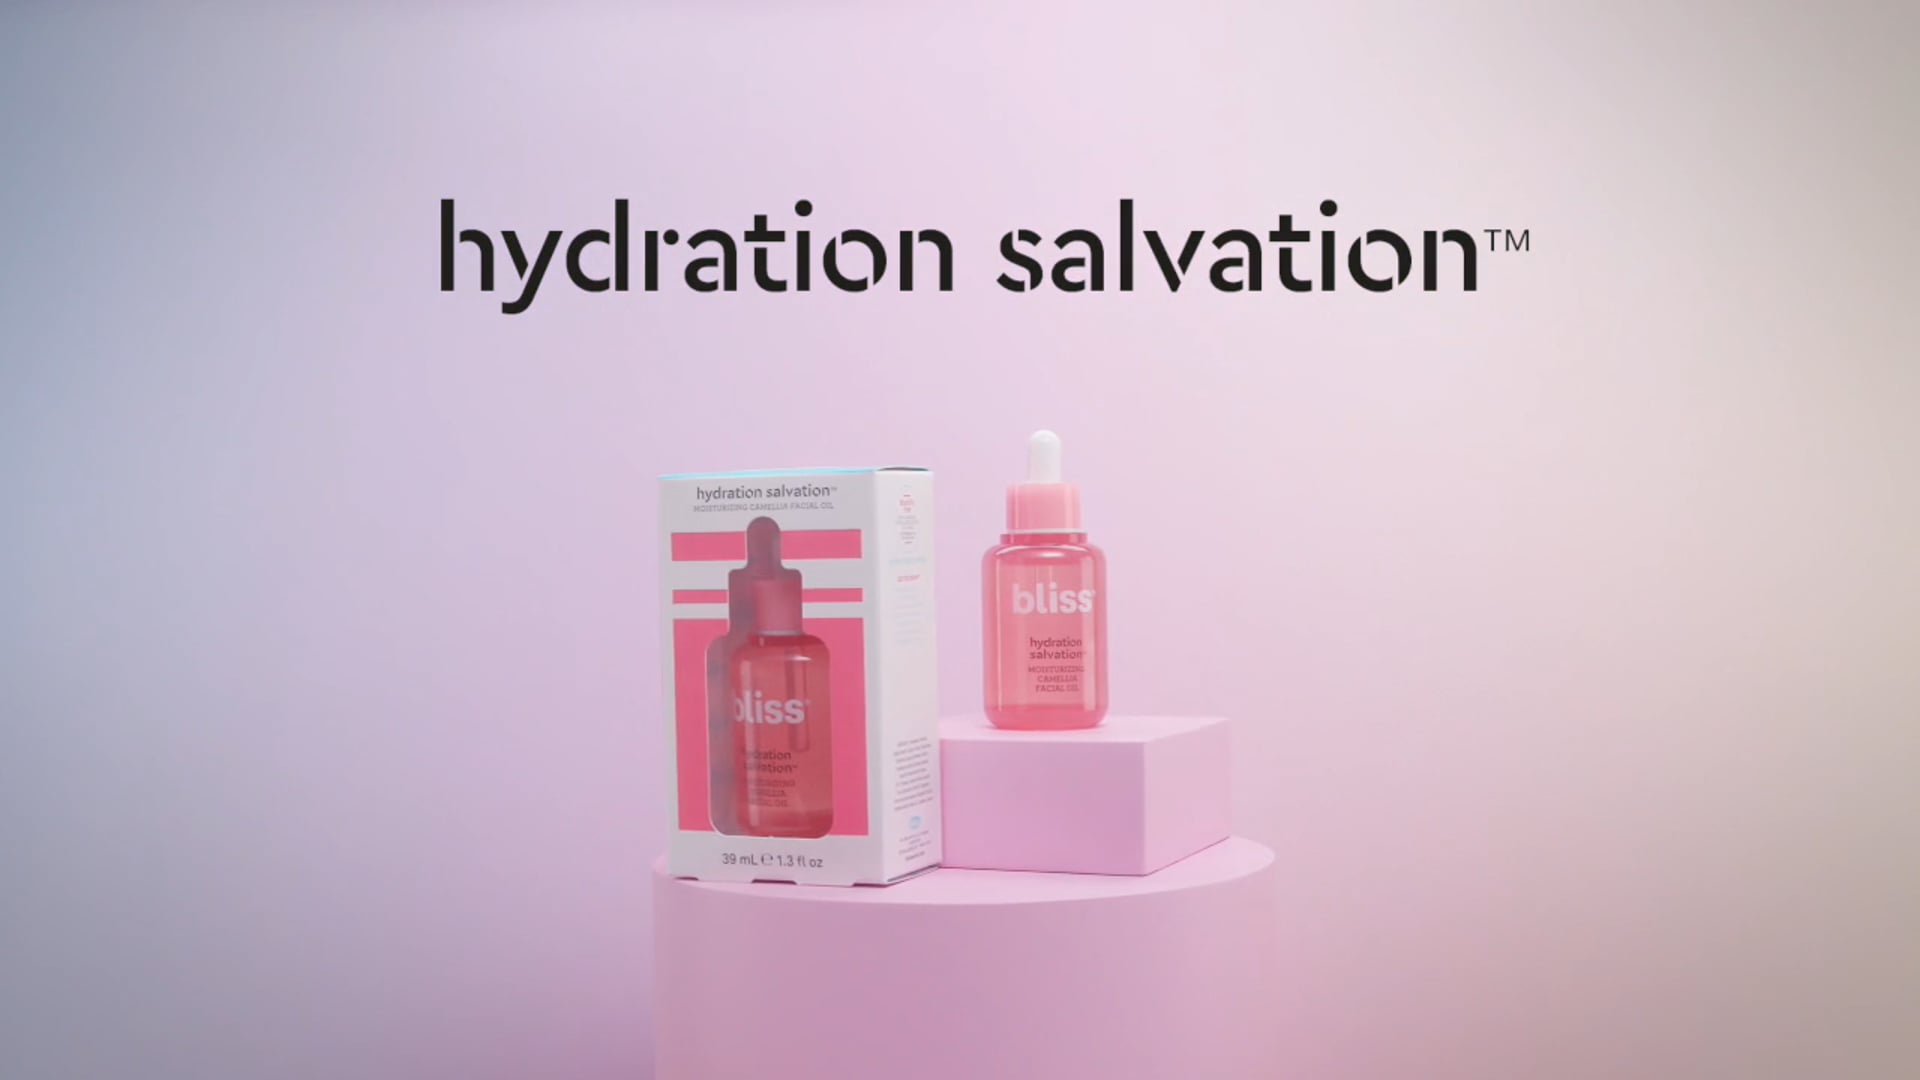 Bliss Hydration Salvation